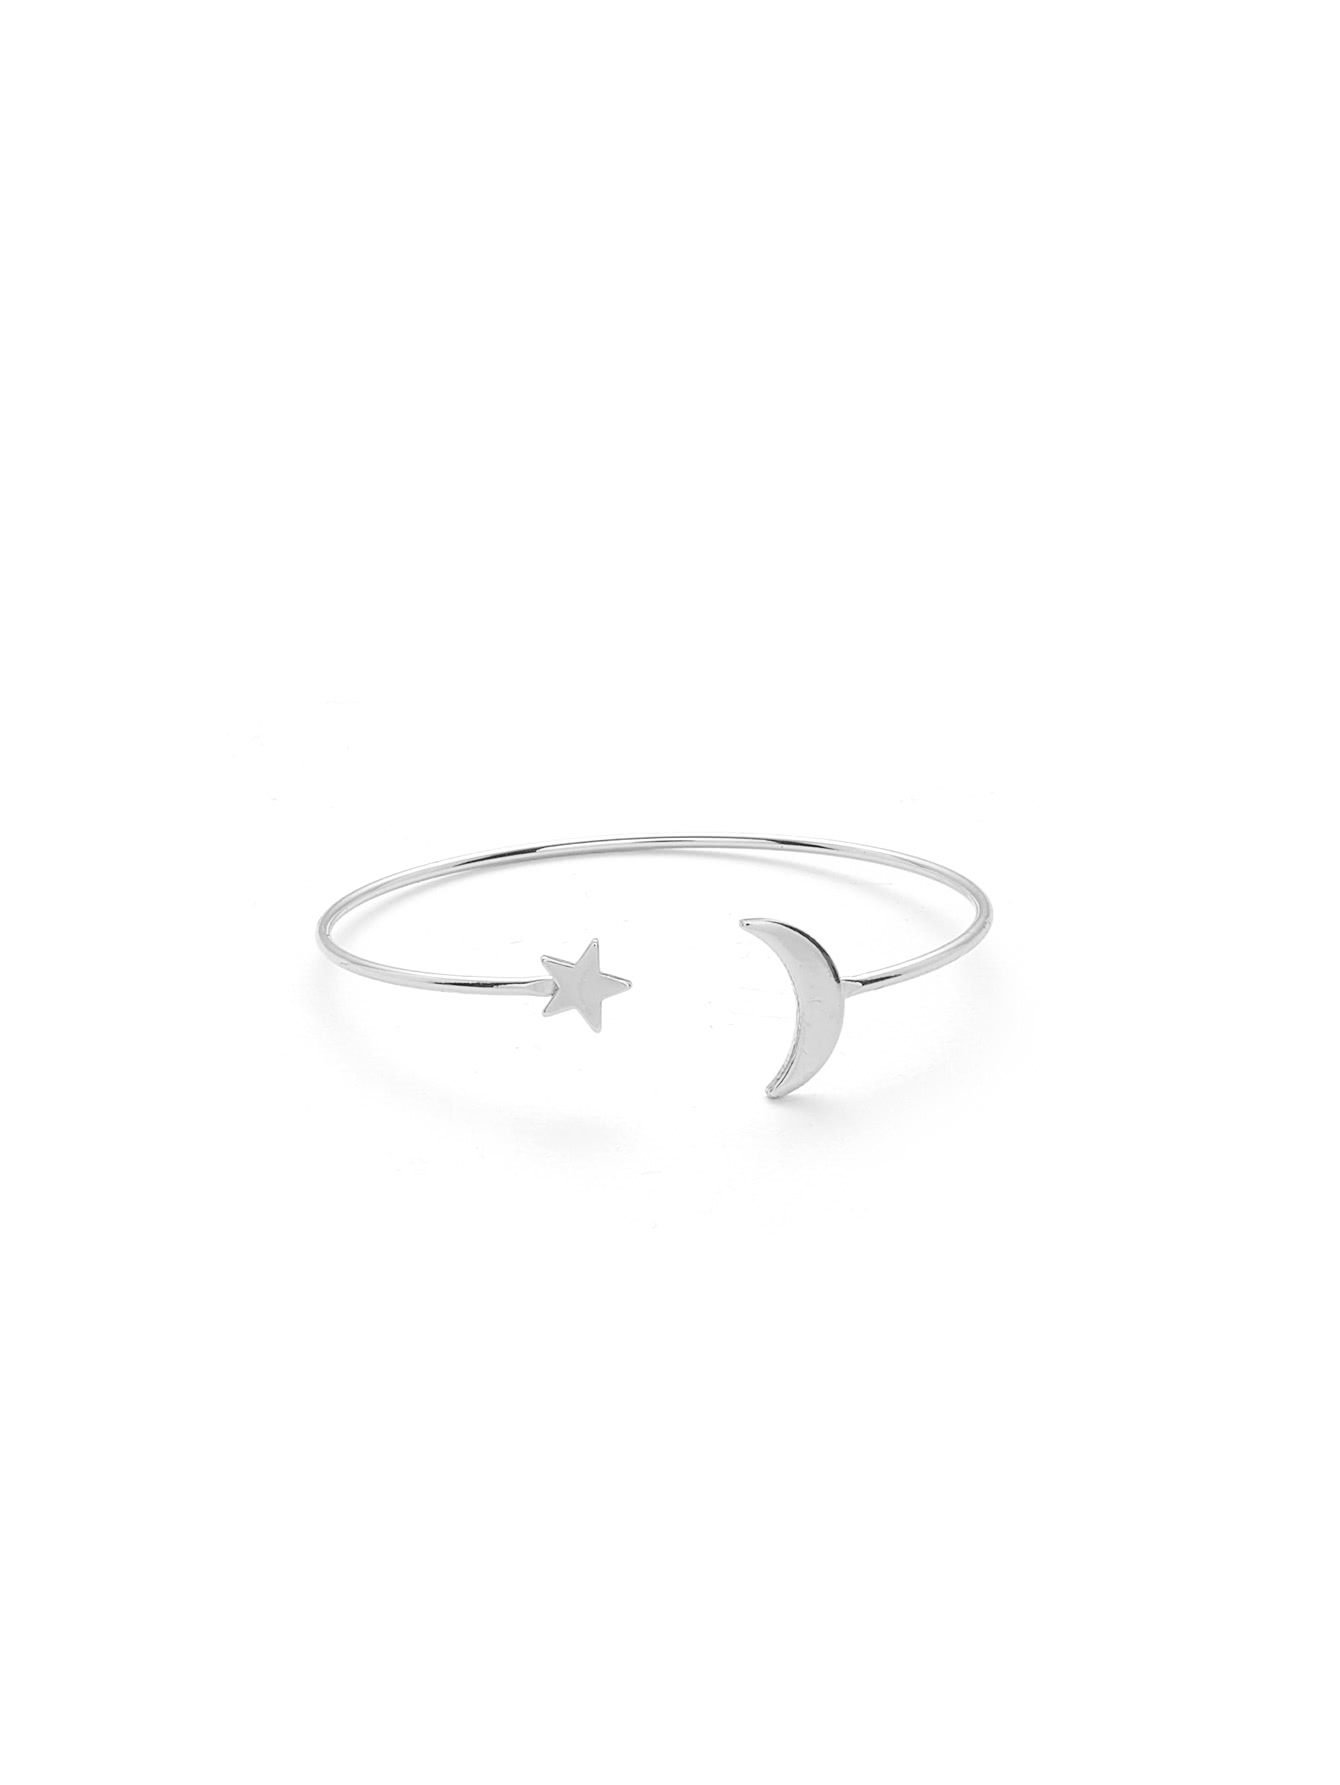 Moon & Star Design Cuff Bracelet все цены